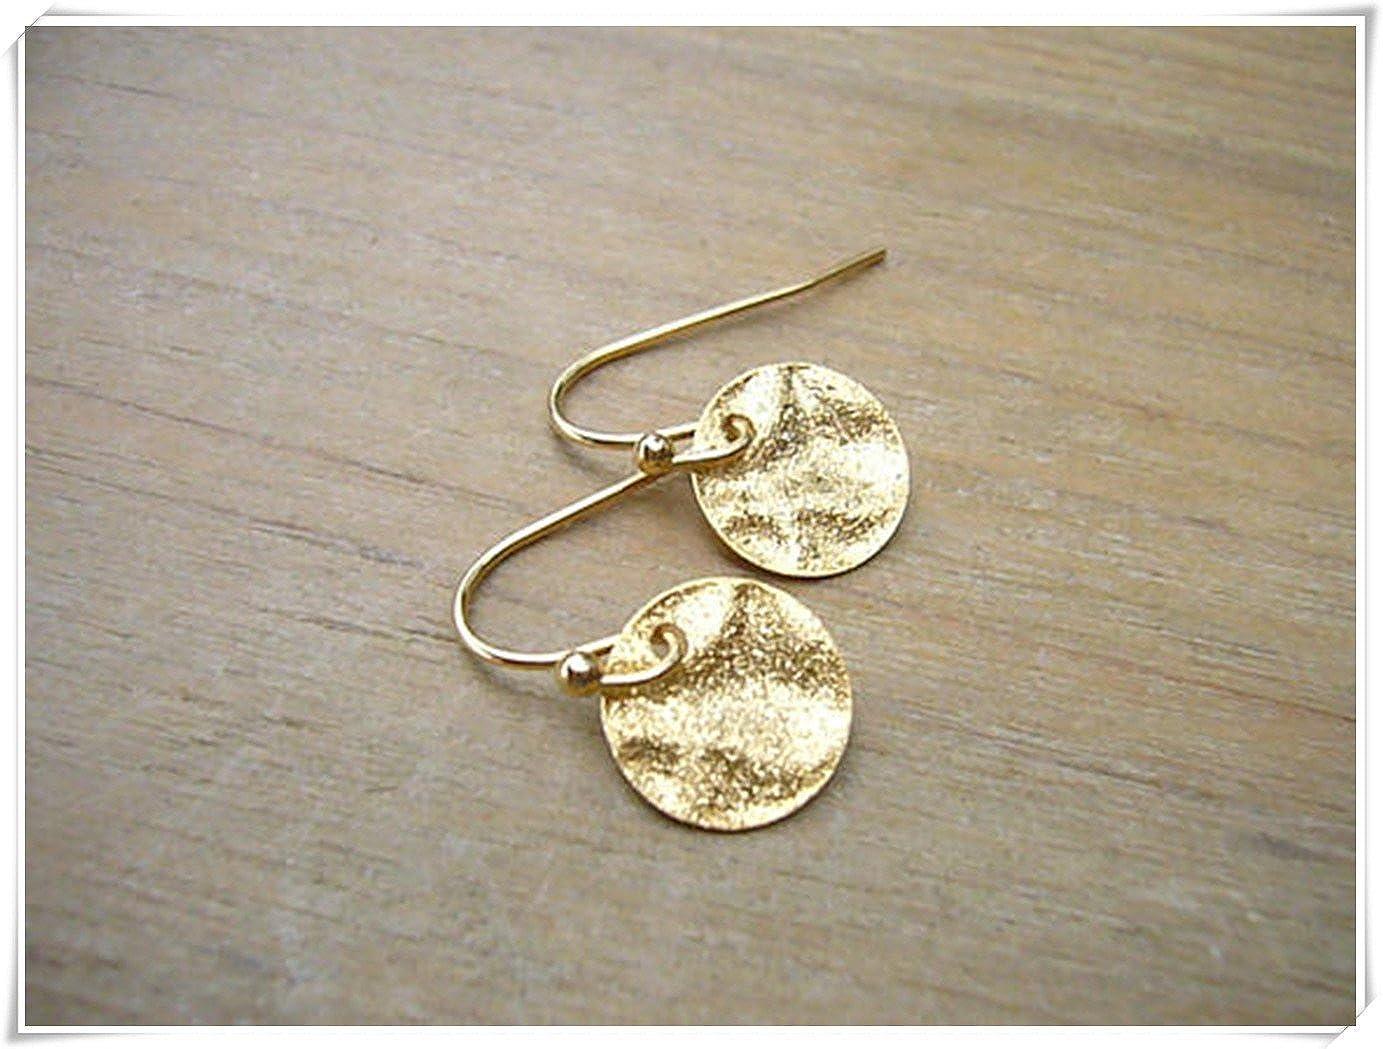 af29a5c5b5e00 Amazon.com: Simple Gold Earrings, Delicate Gold Earrings, Minimalist ...